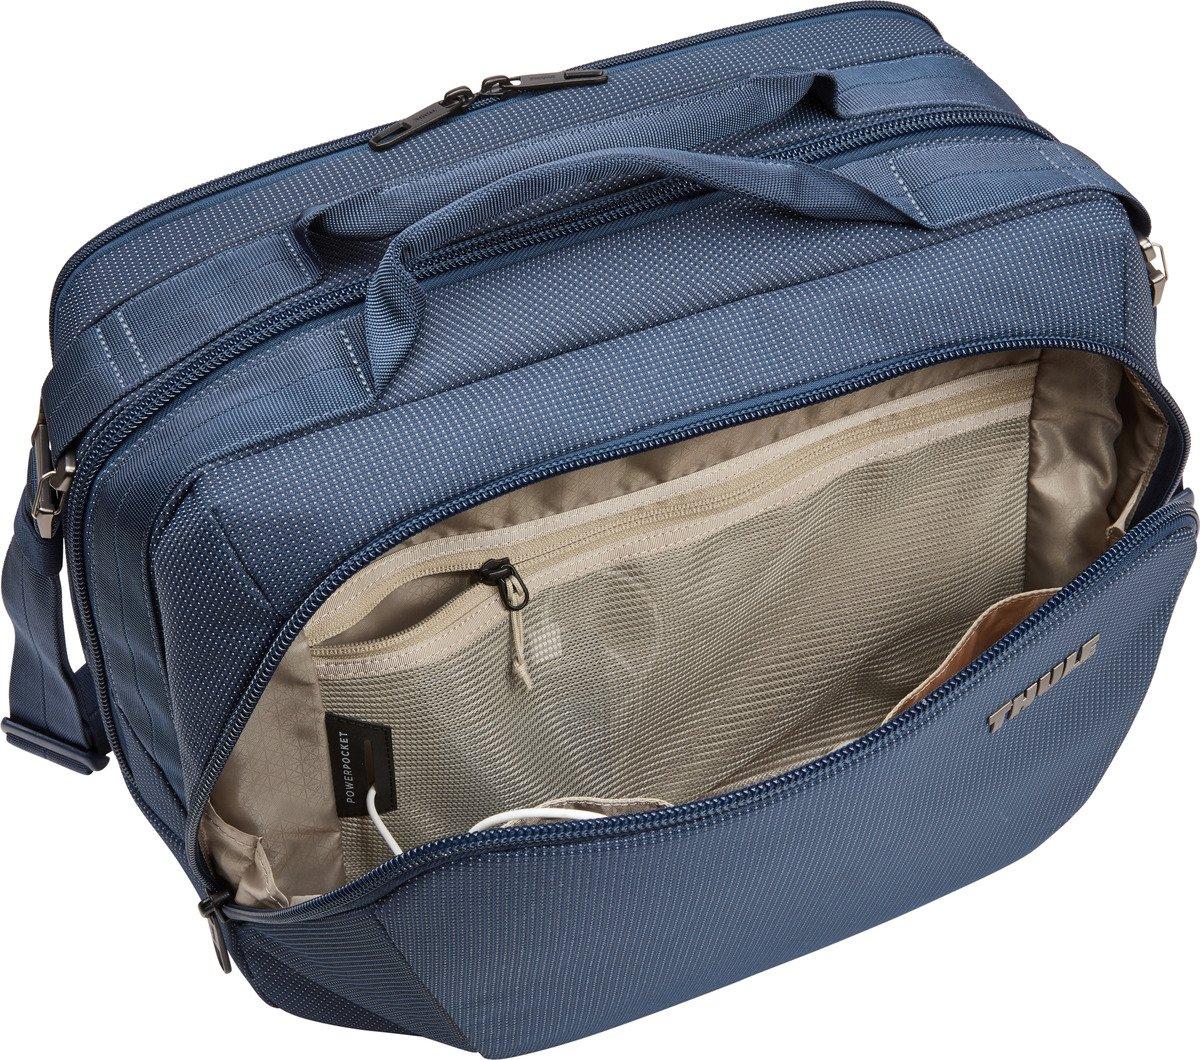 Torba podróżna Thule Crossover 2 Boarding Bag 25L niebieska